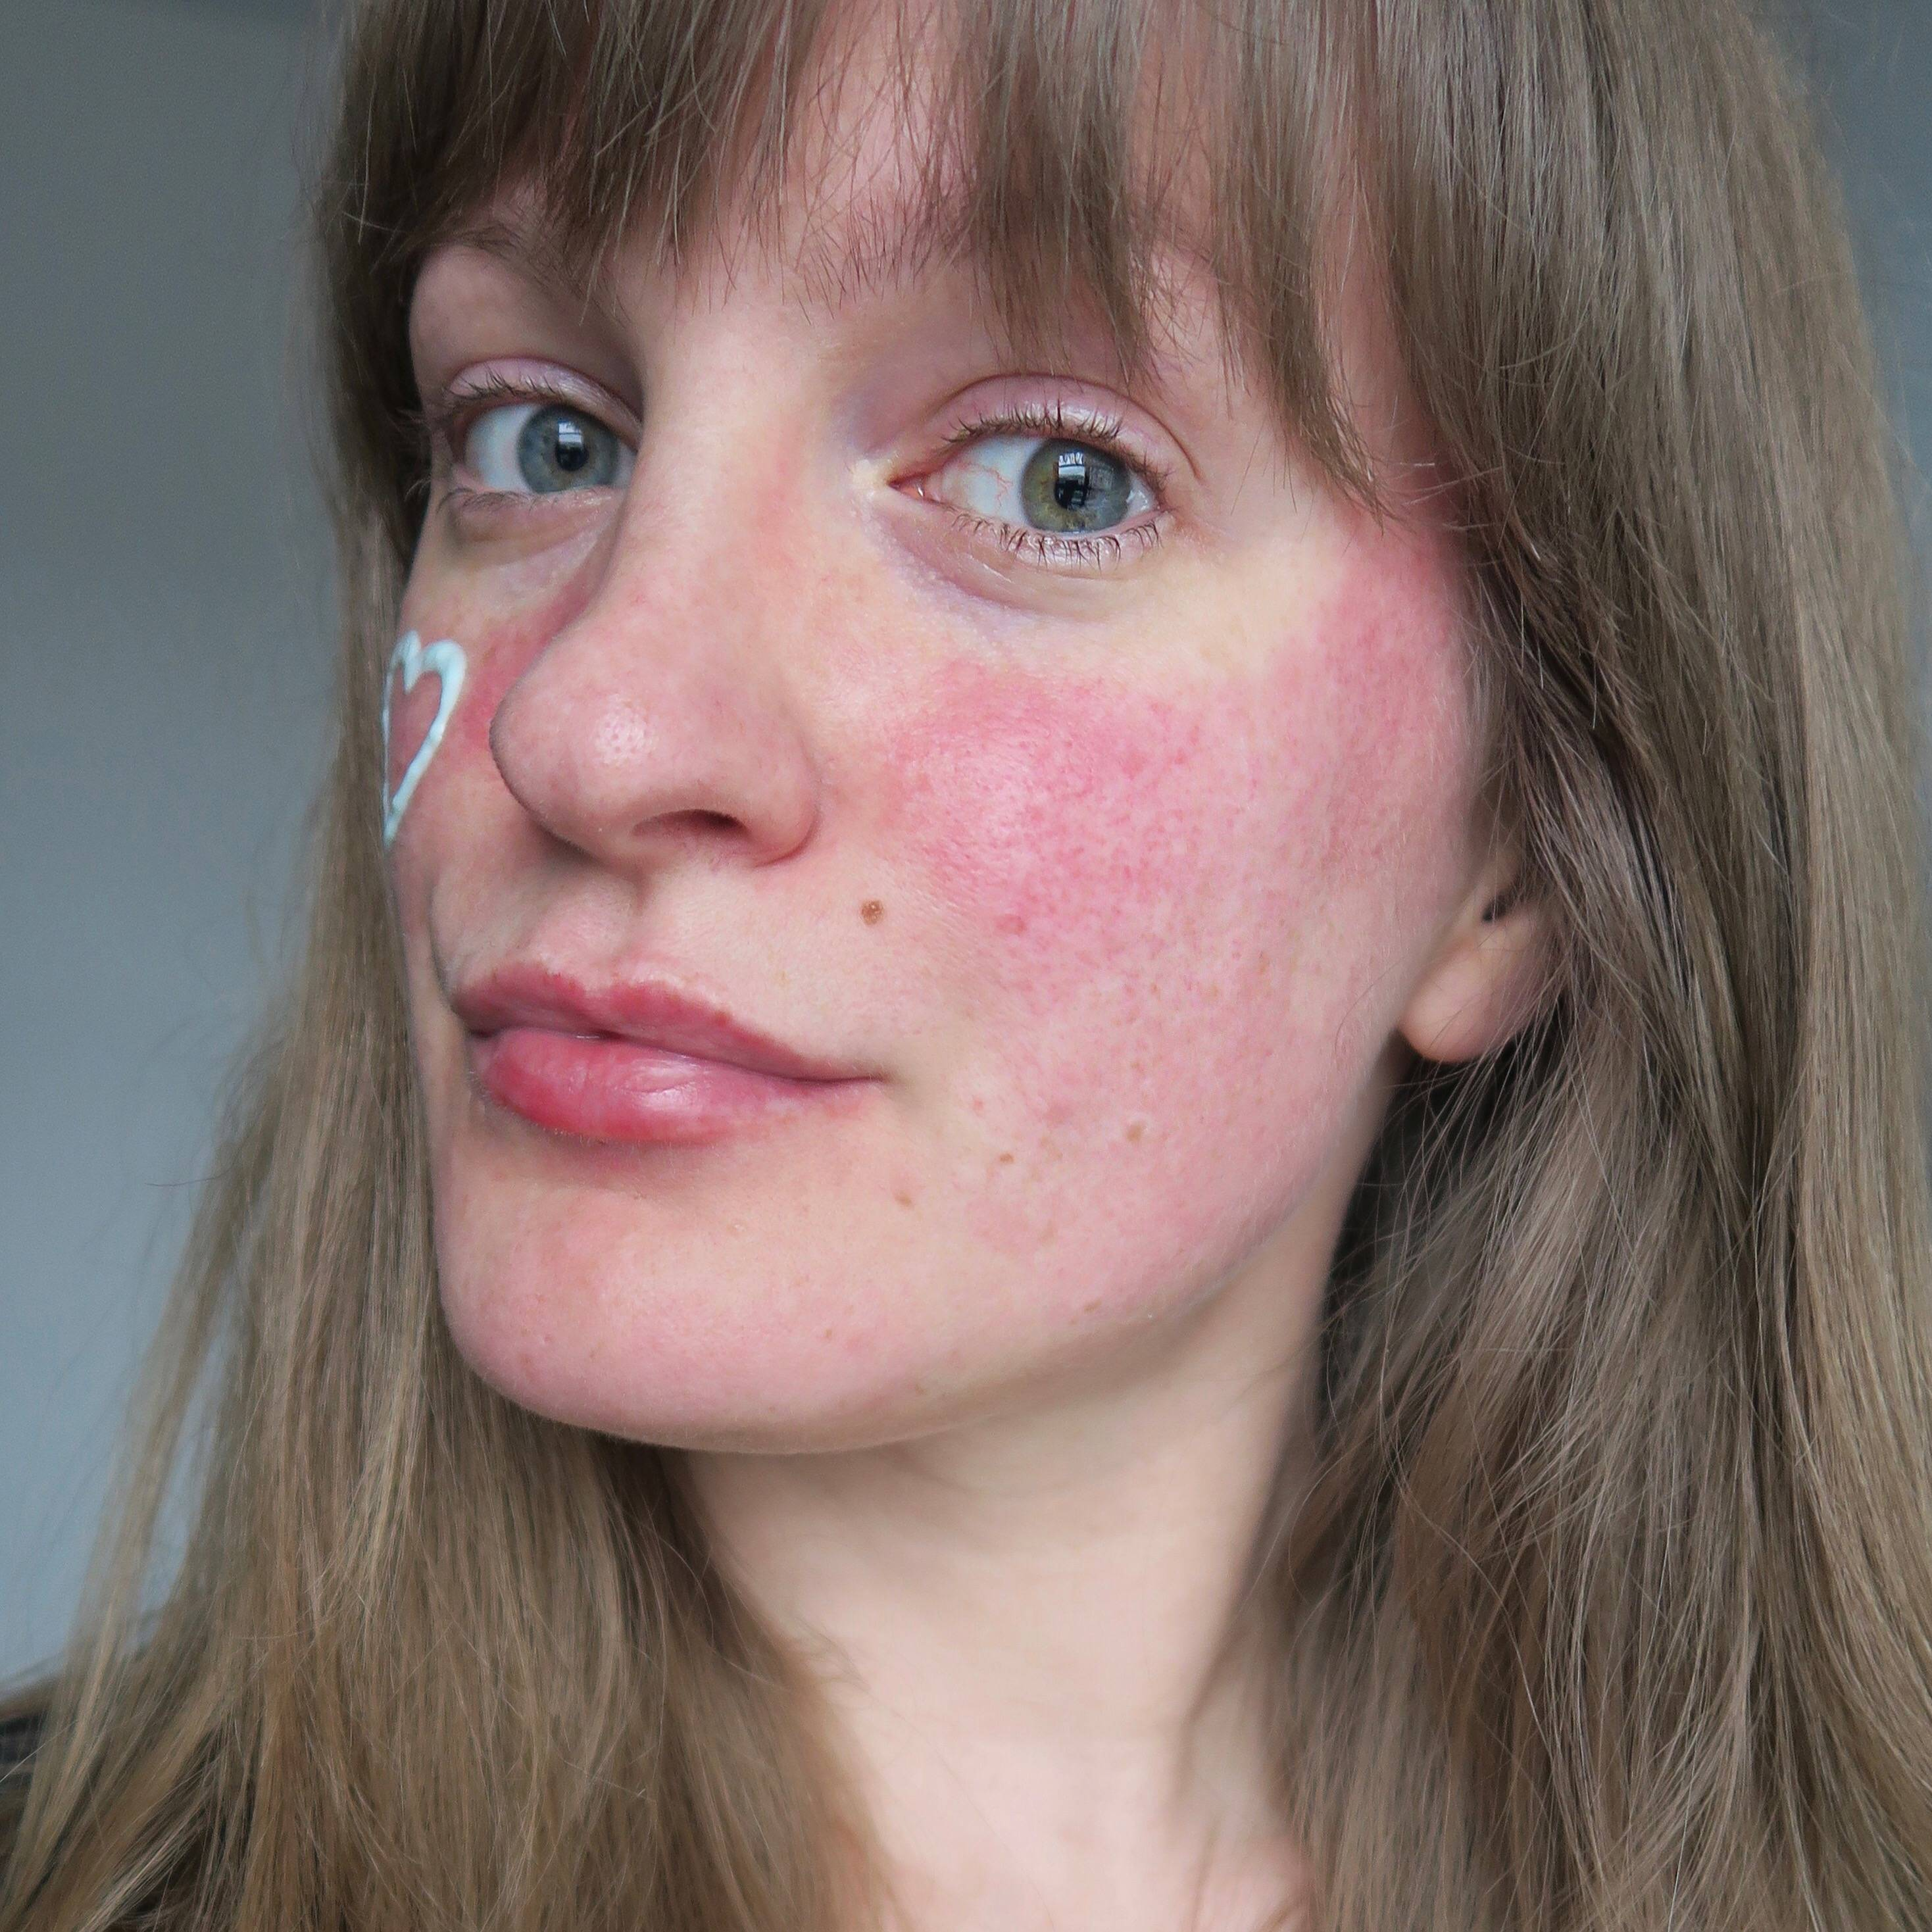 7 кремов от розацеа на лице, препараты для лечения, список антибиотиков, мази, средства и косметика